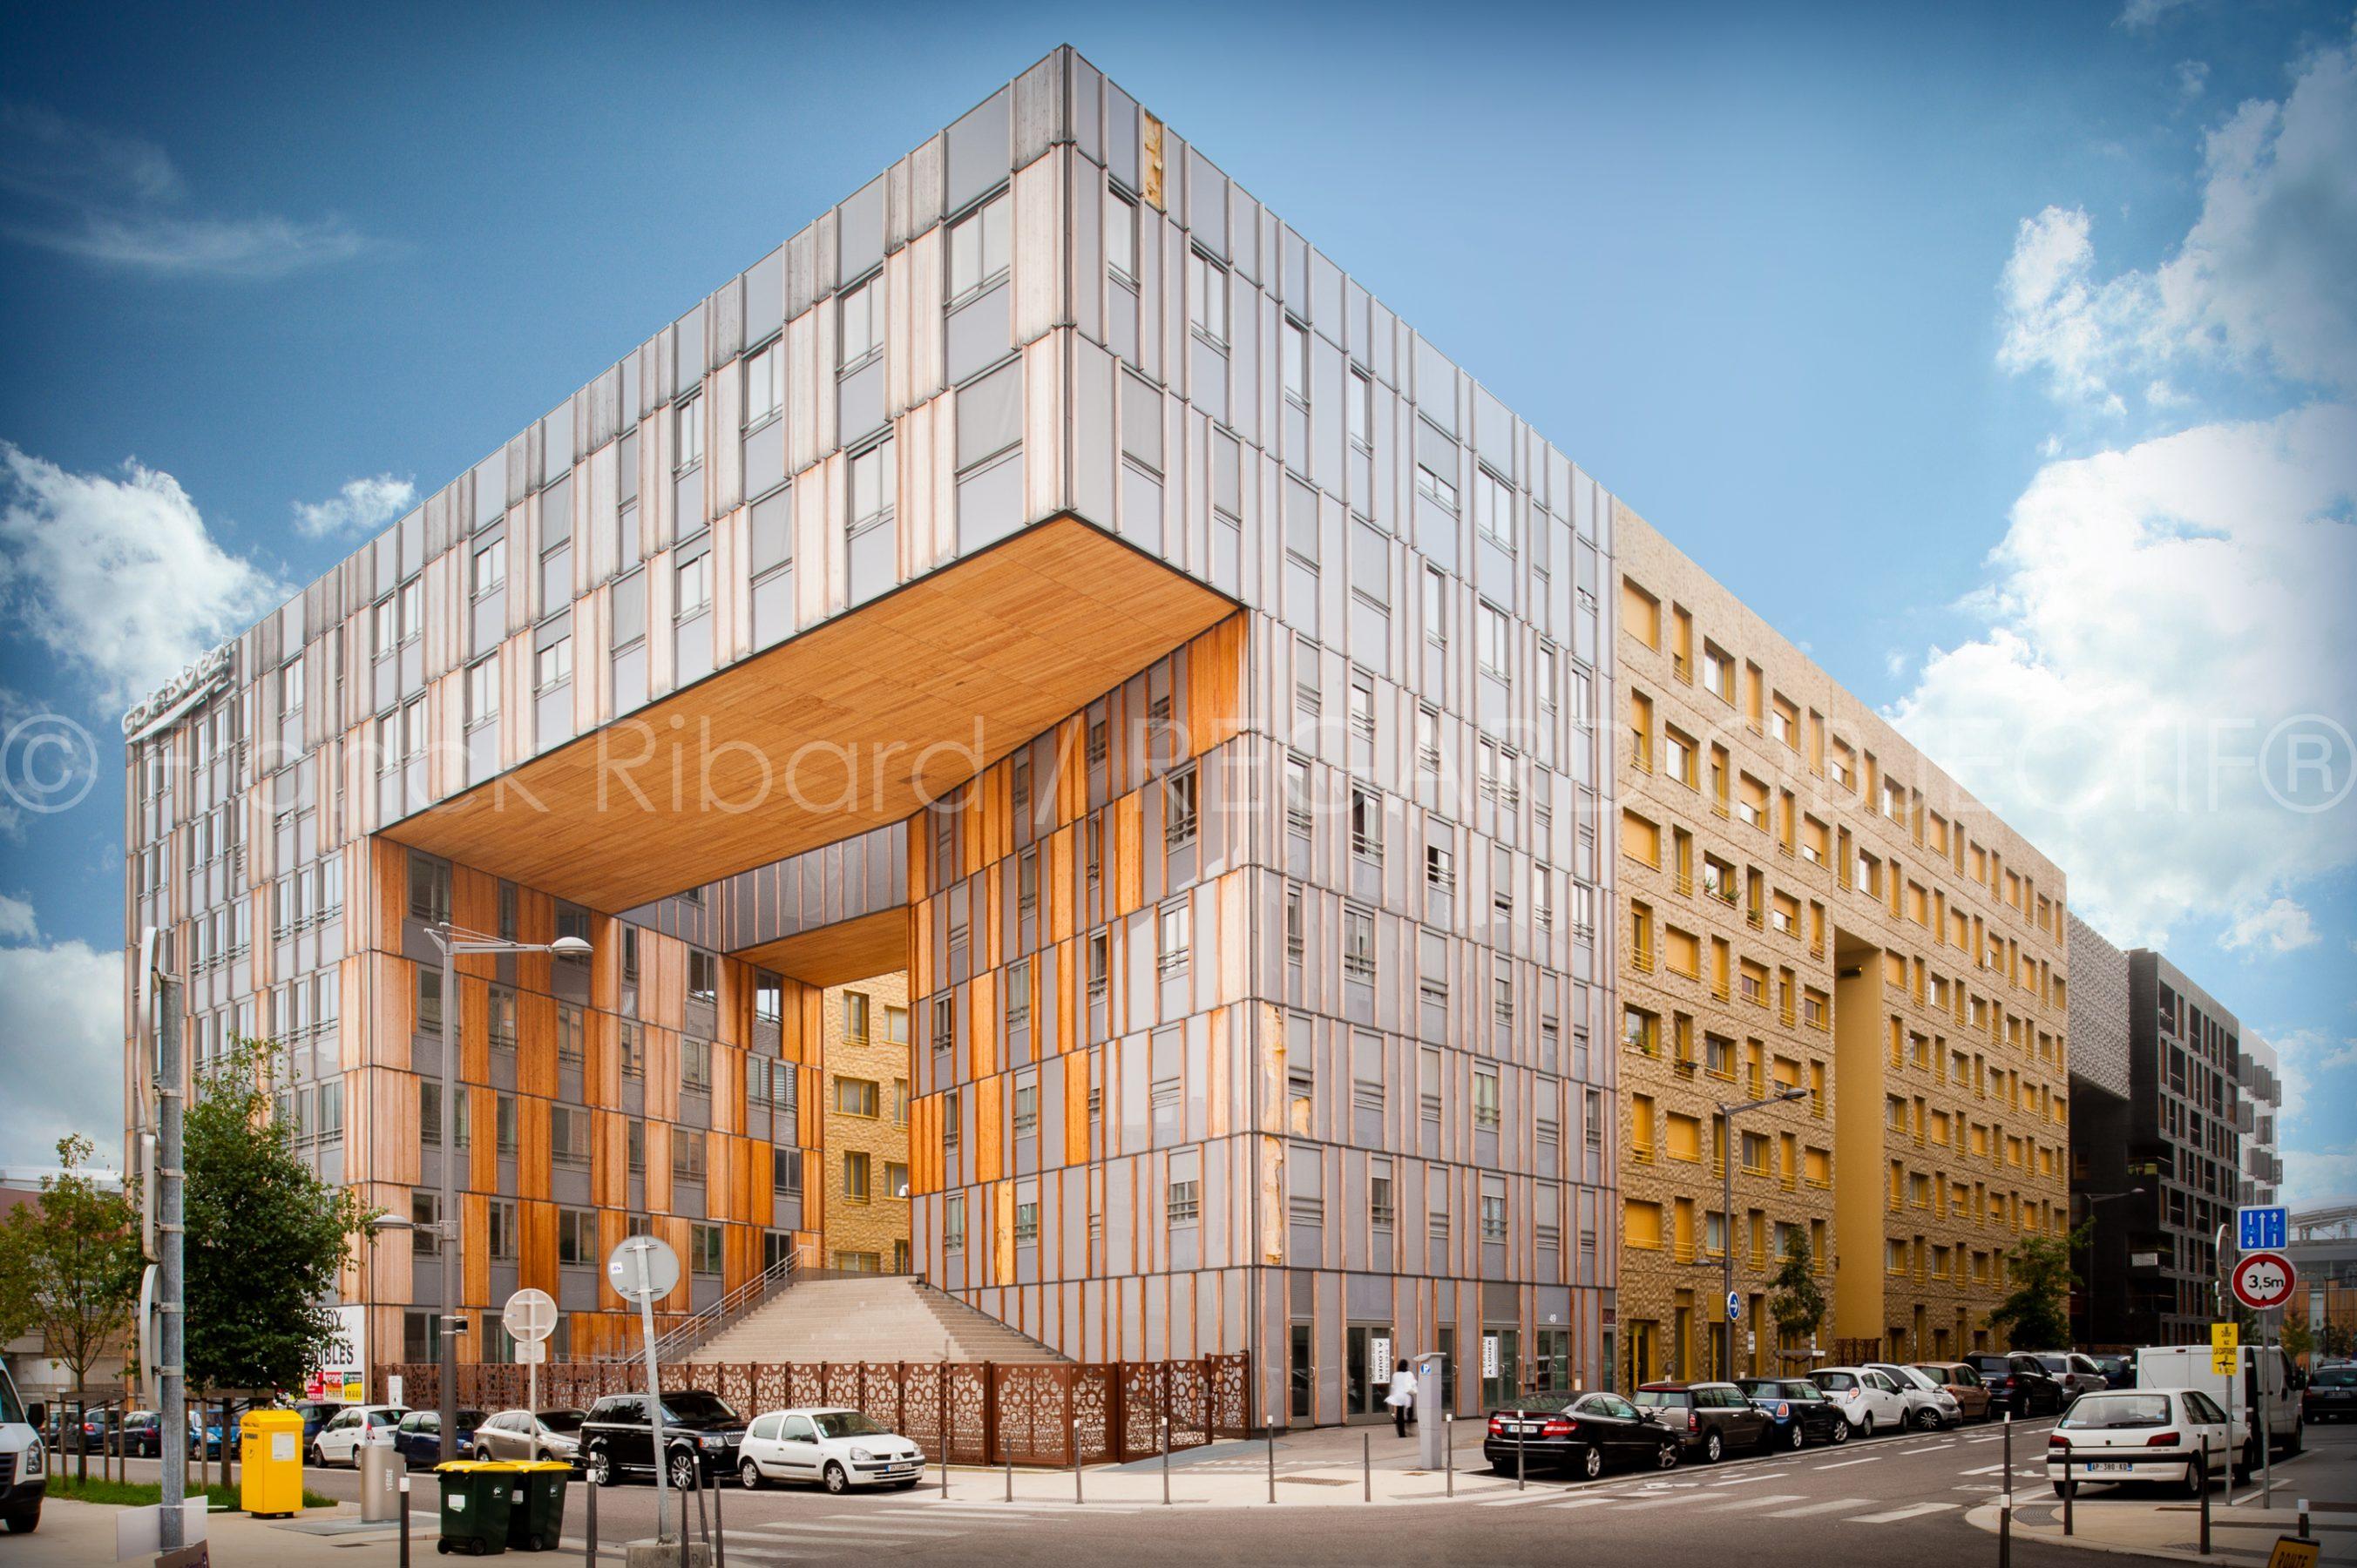 photographie de franck ribard - regard objectif - photographe architecture lyon - Monolithe Confluence